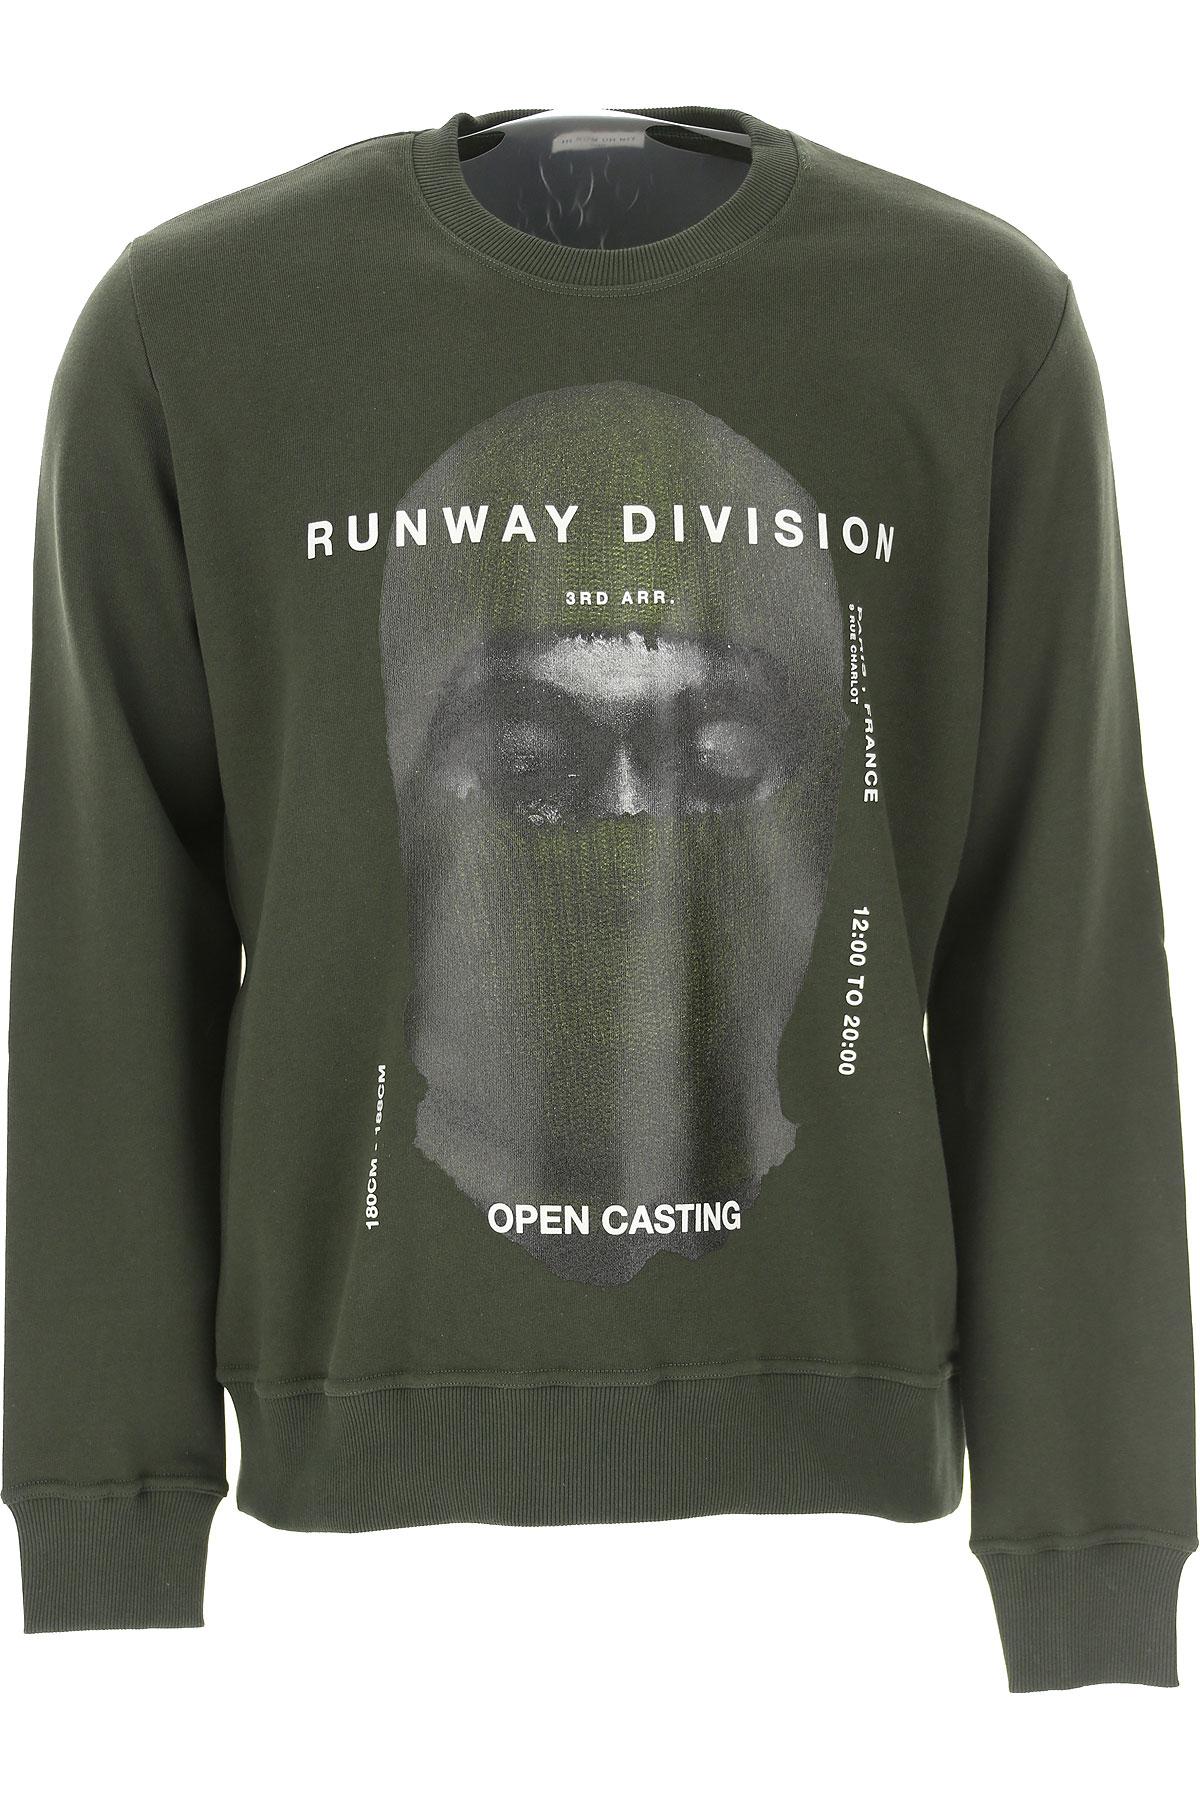 Ih Nom Uh Nit Sweatshirt for Men On Sale, Military Green, Cotton, 2019, L M S XL